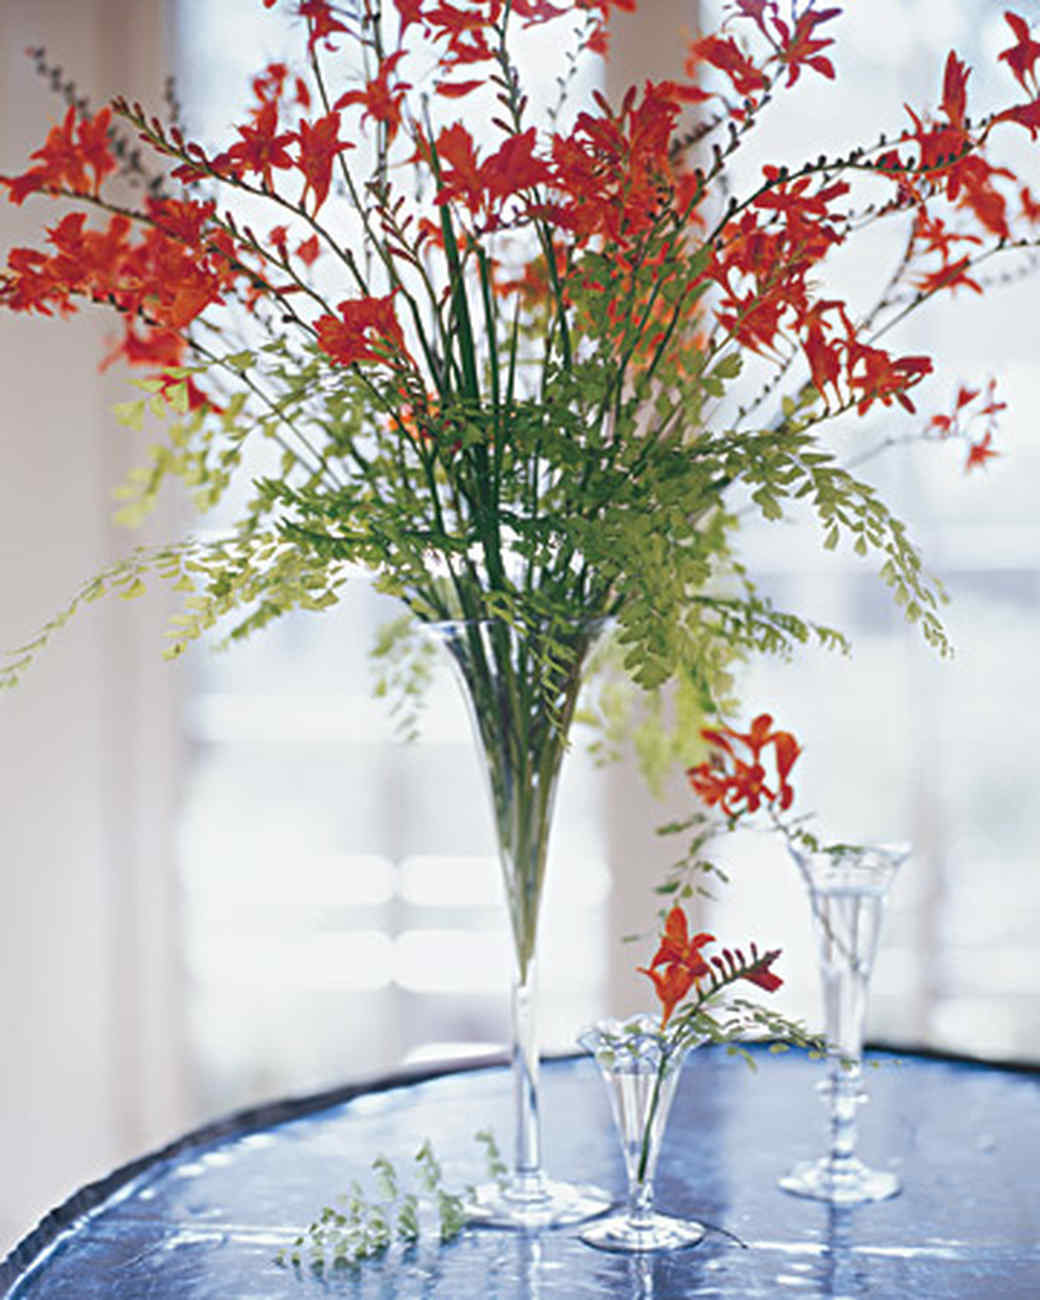 29 Stunning Fish Bowl Flower Vase 2021 free download fish bowl flower vase of marthas flower arranging secrets martha stewart regarding lesson 3